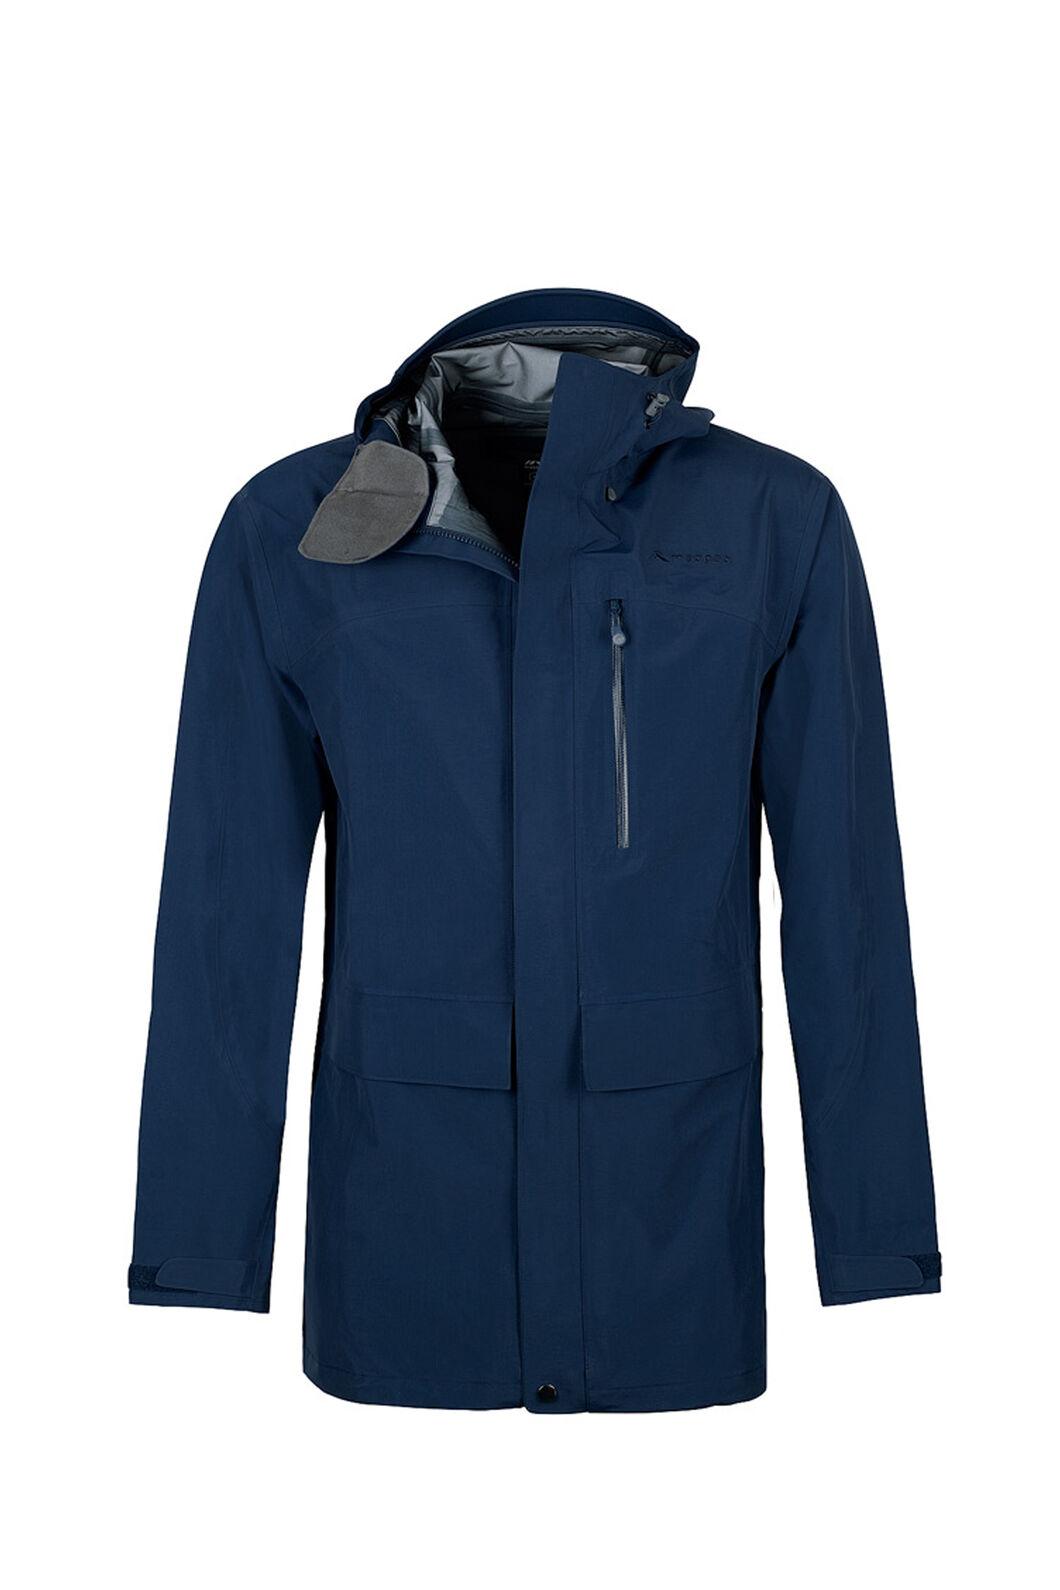 Macpac Resolution Pertex® Rain Jacket — Men's, Black Iris, hi-res